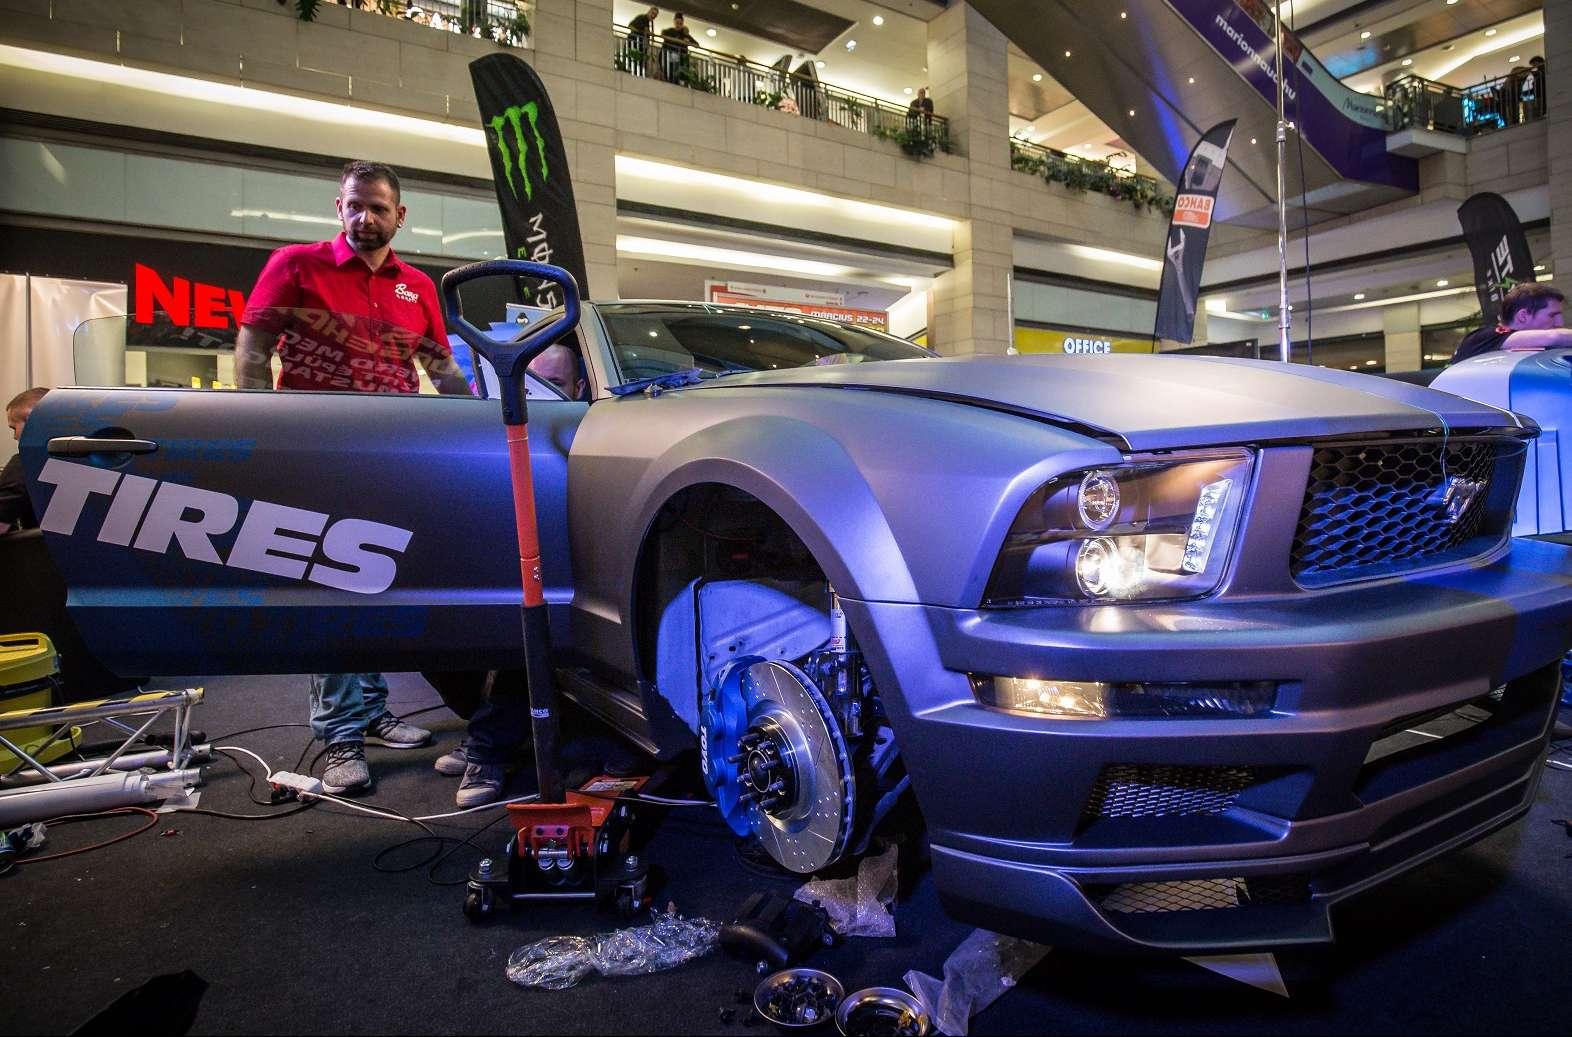 Ford Mustang AMTS acingline, racinglinehu, racingline,hu